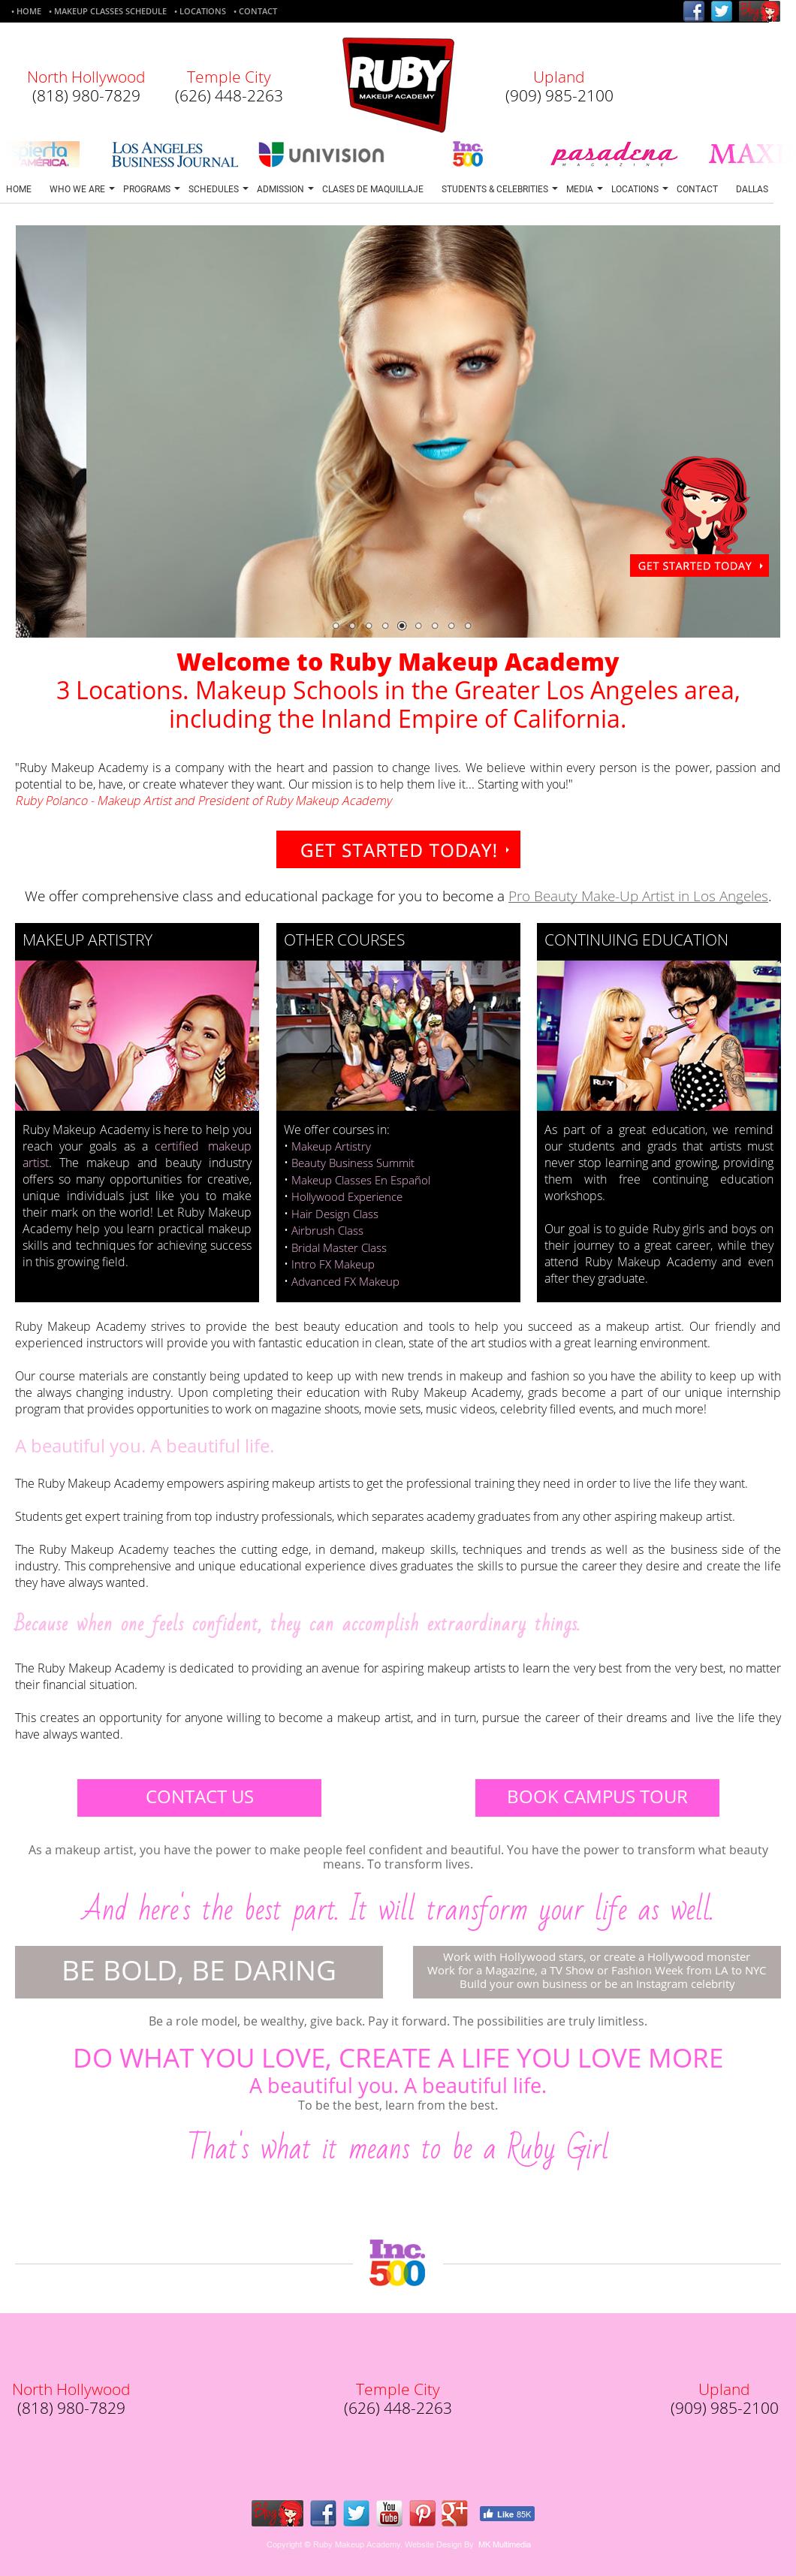 Website History. Website History. Ruby Makeup Academy ...